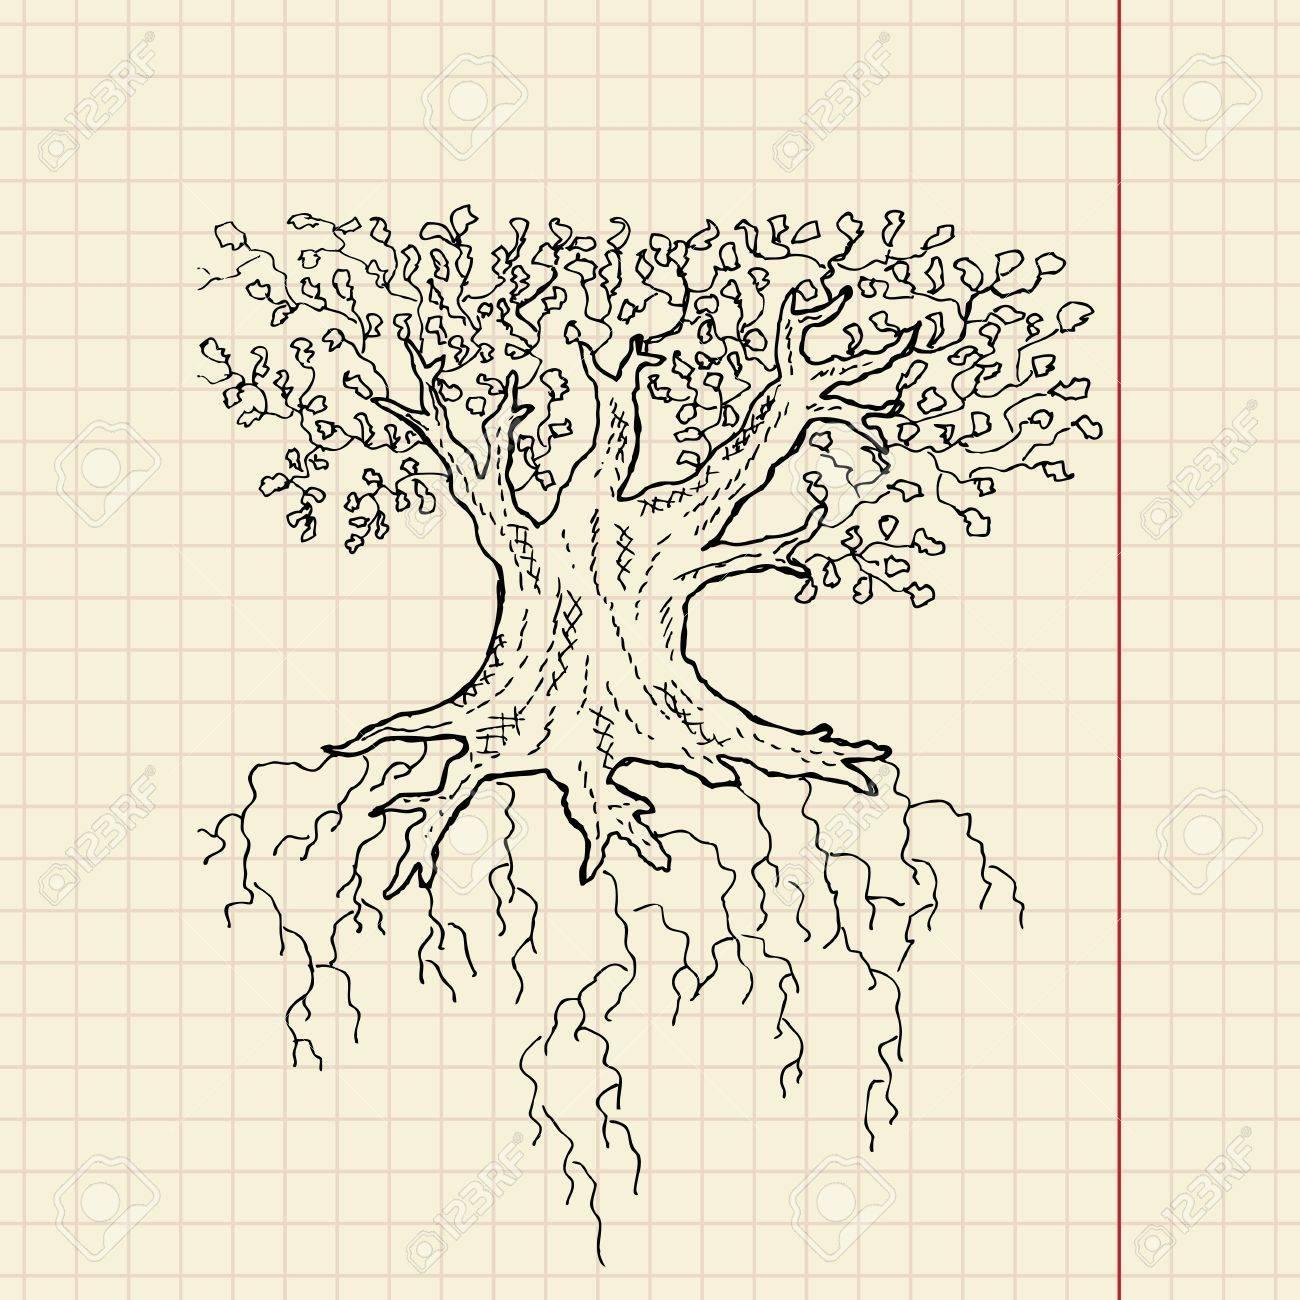 Oak tree sketch on school paper, vector illustration, eps 10 Stock Vector - 11377806